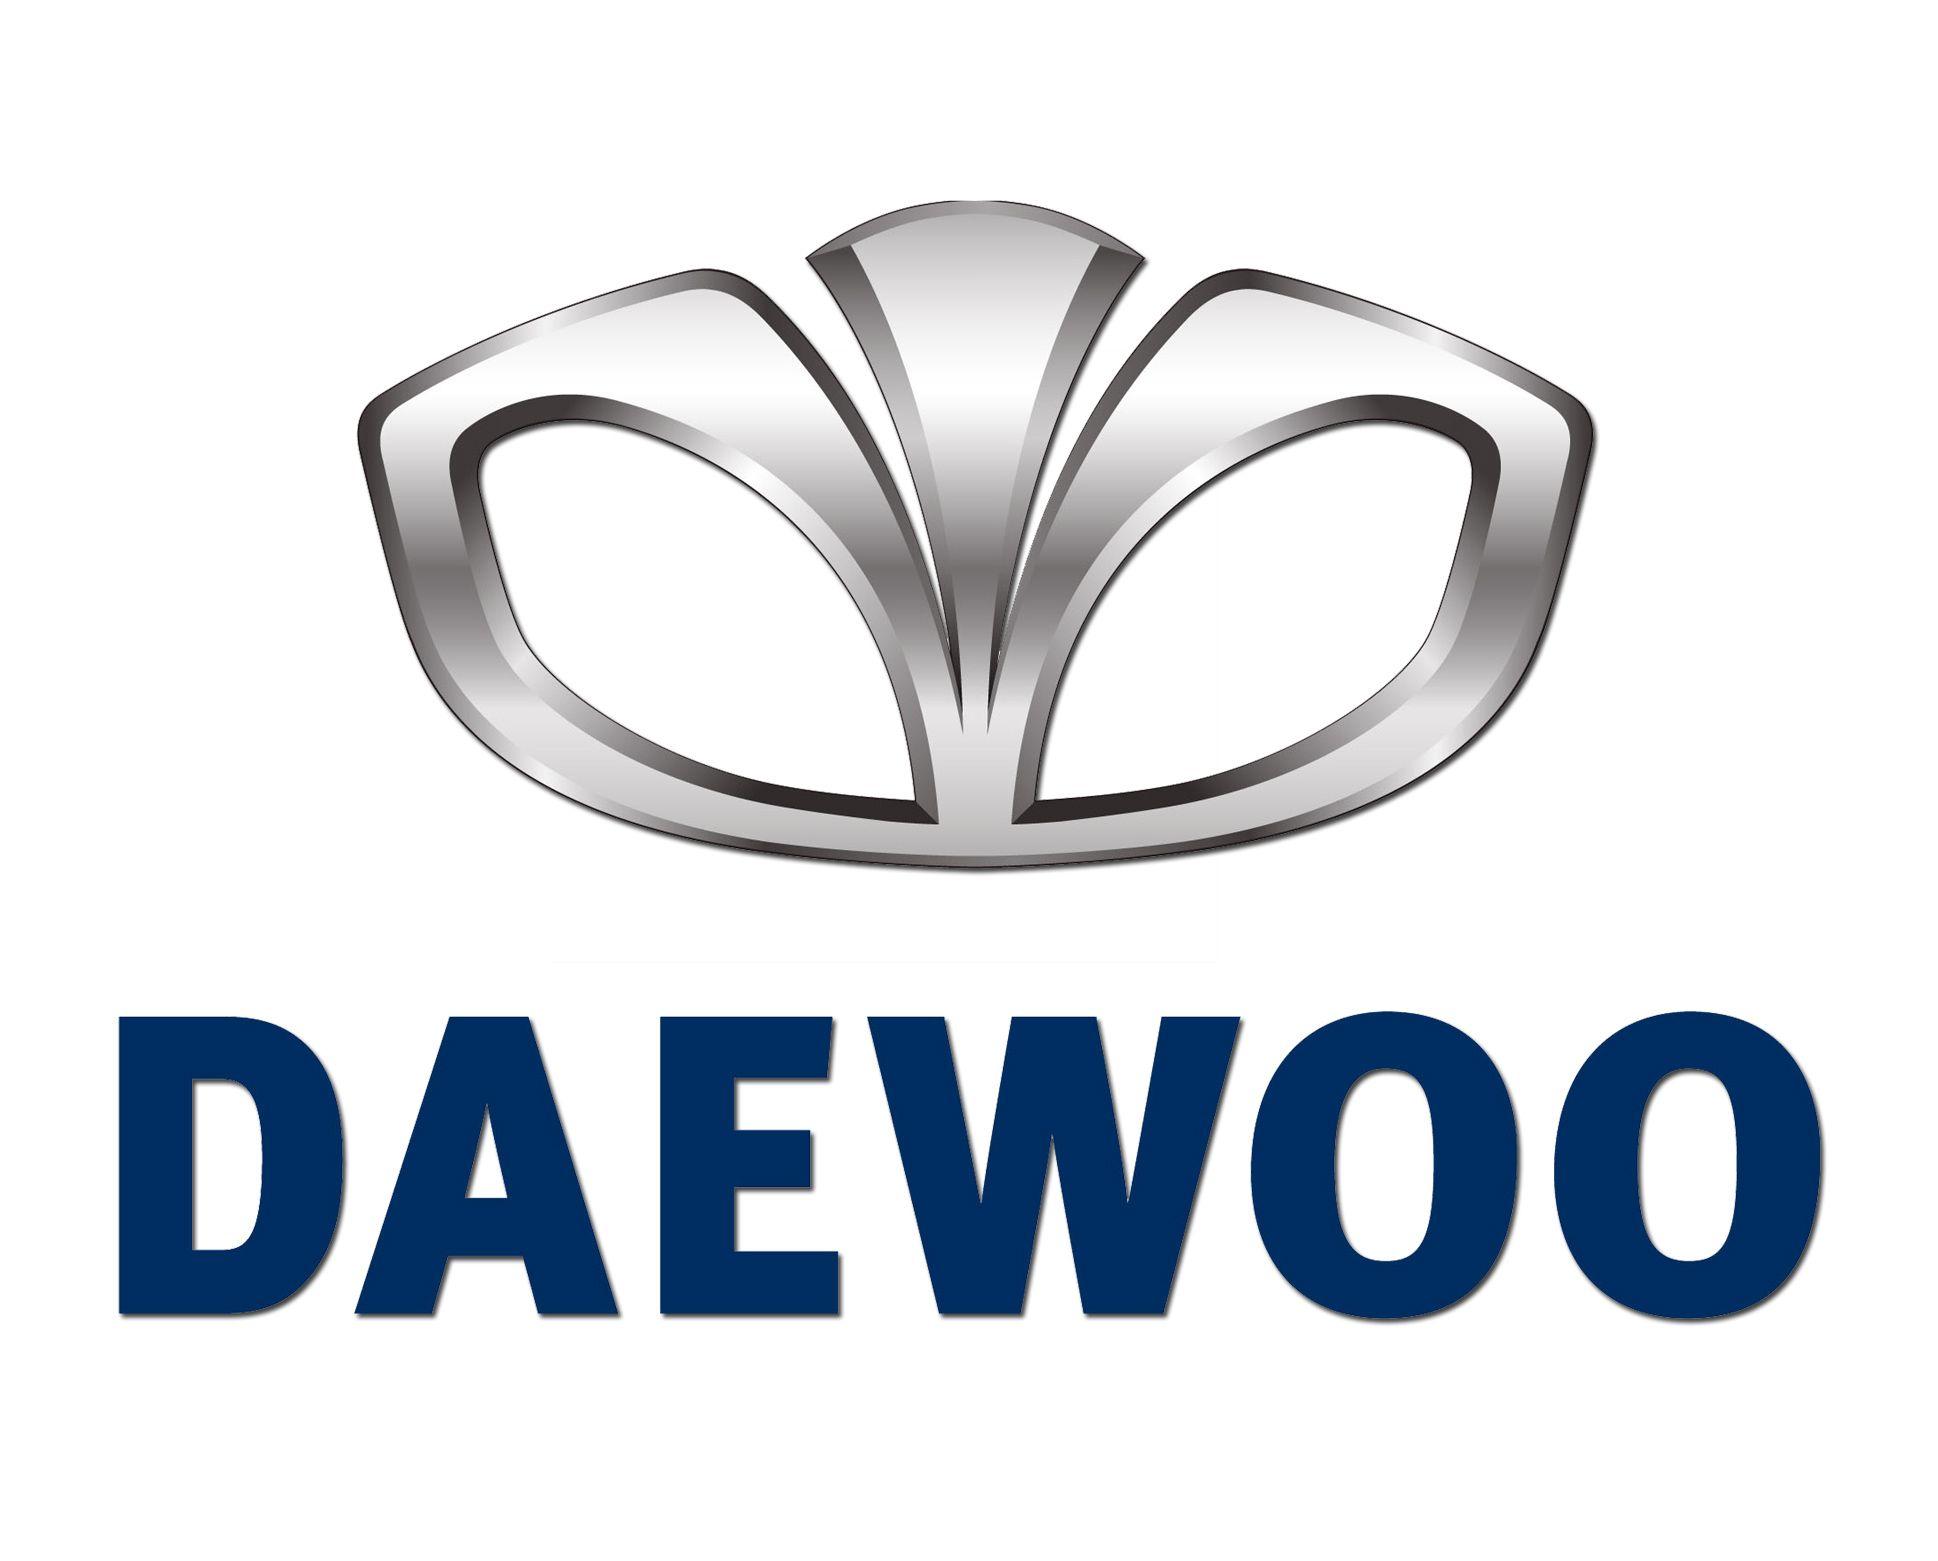 DaewooCarsLogoEmblem All Car Logos Pinterest Car Logos - Car signs and namescar logos with wings azs cars